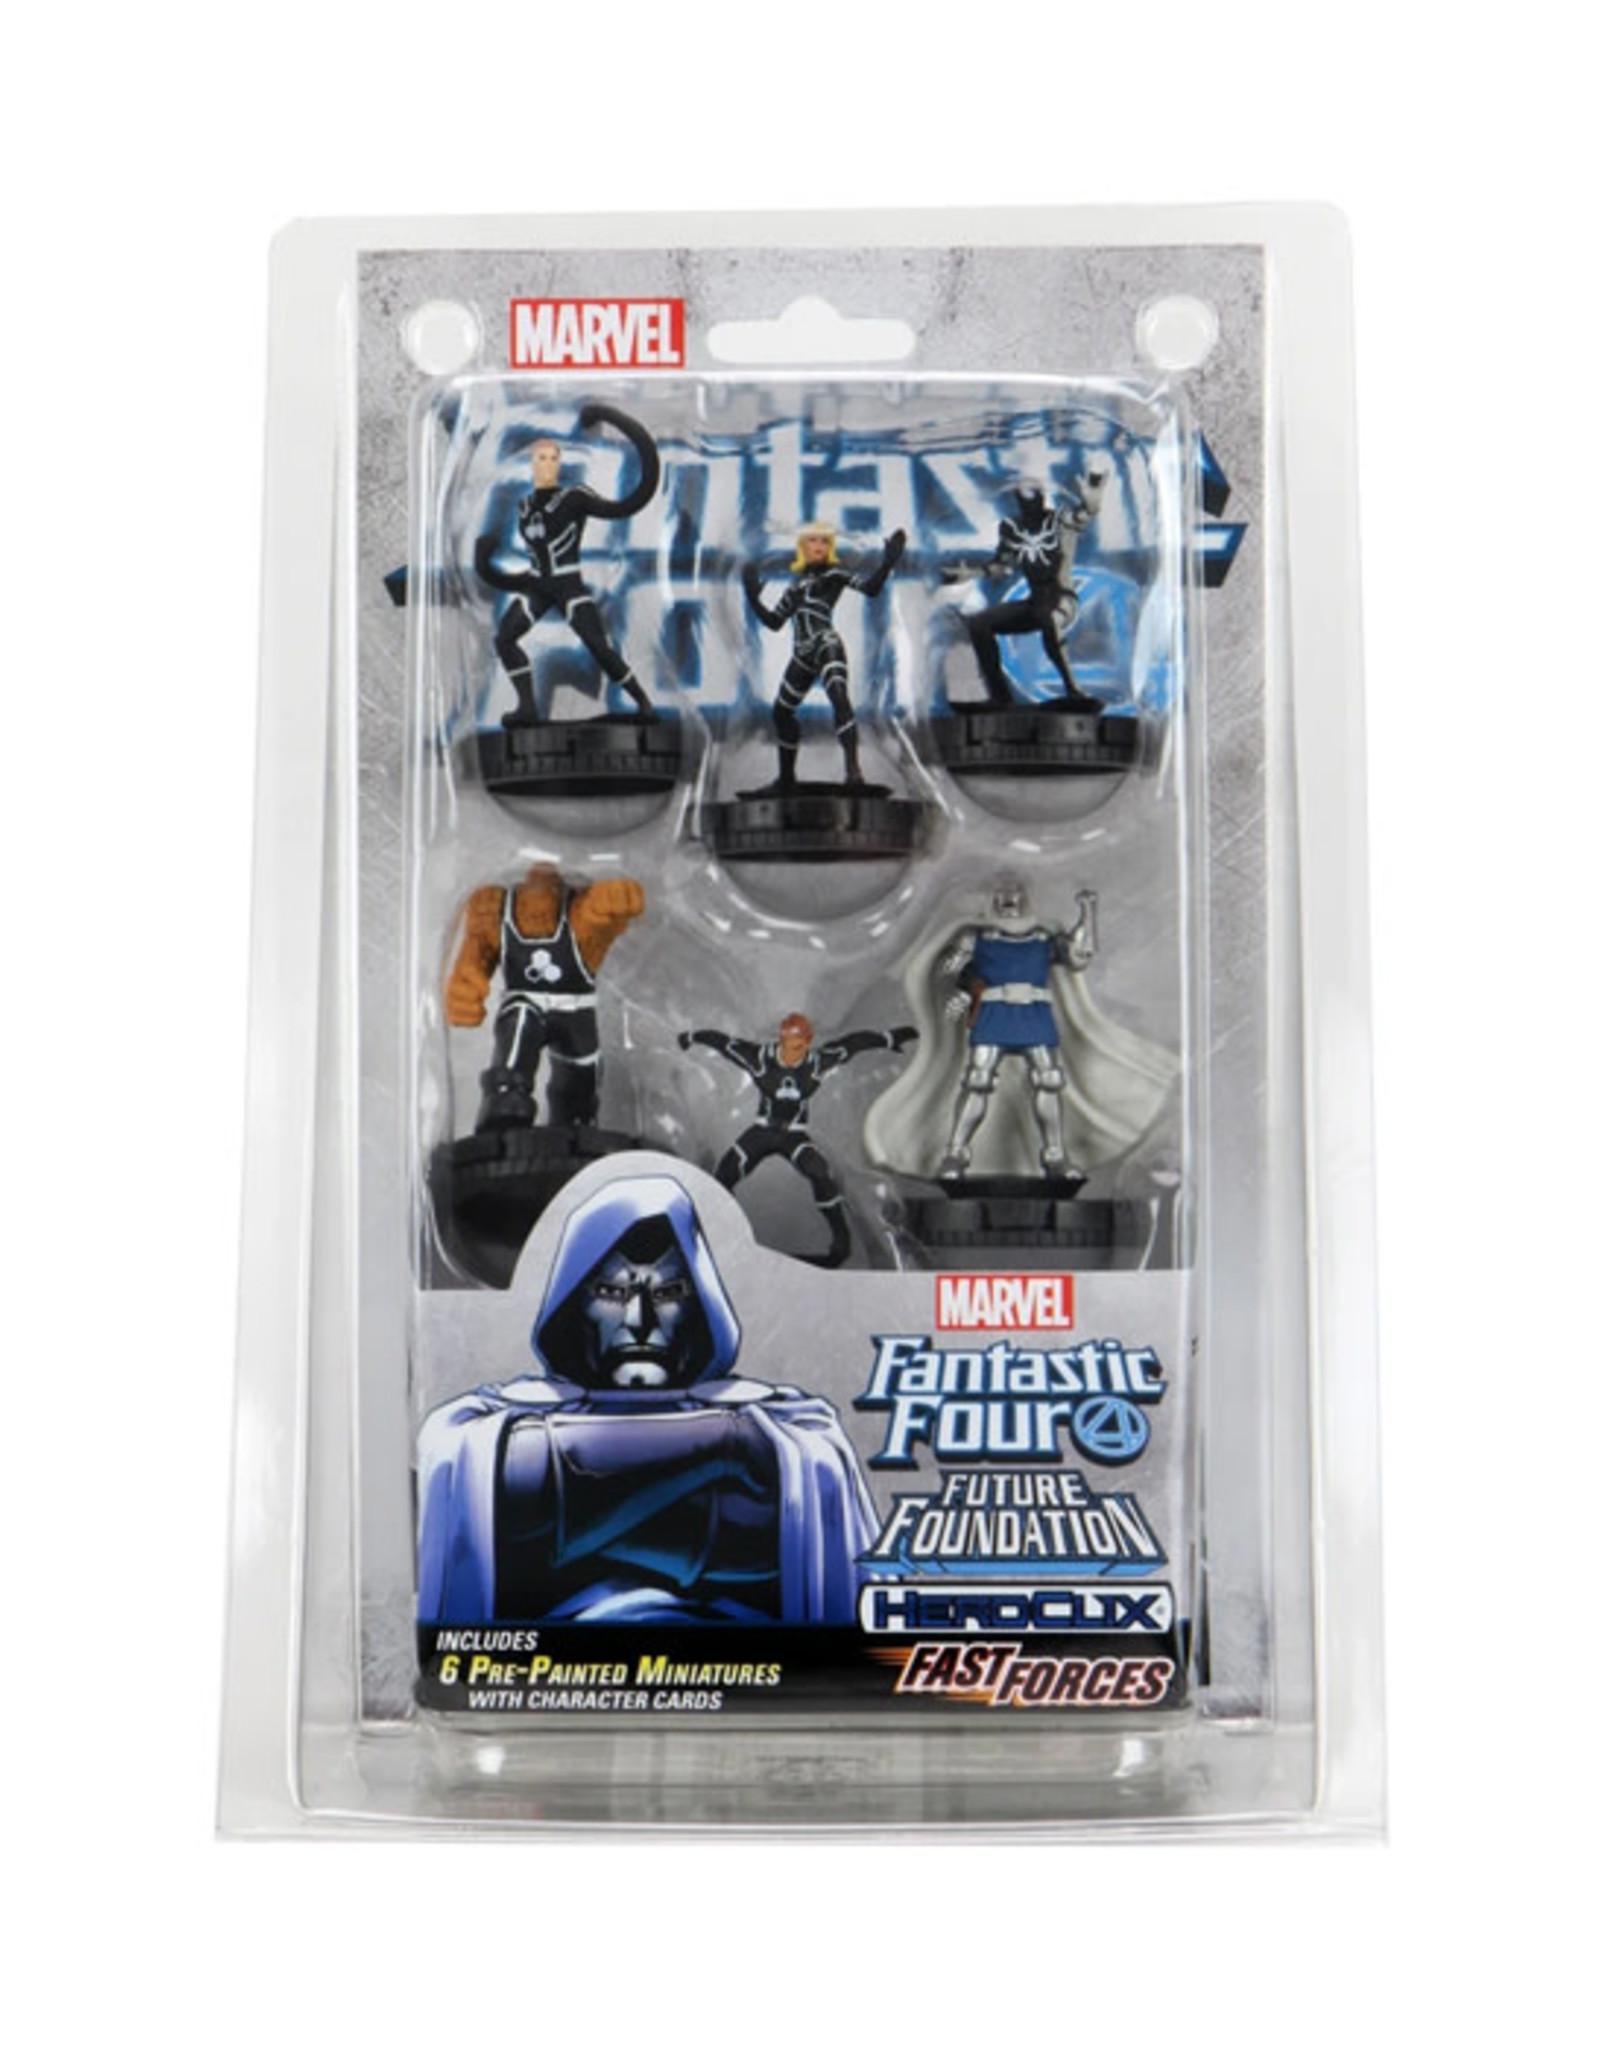 HeroClix HeroClix: Fantastic Four - Future Foundation - Fast Forces